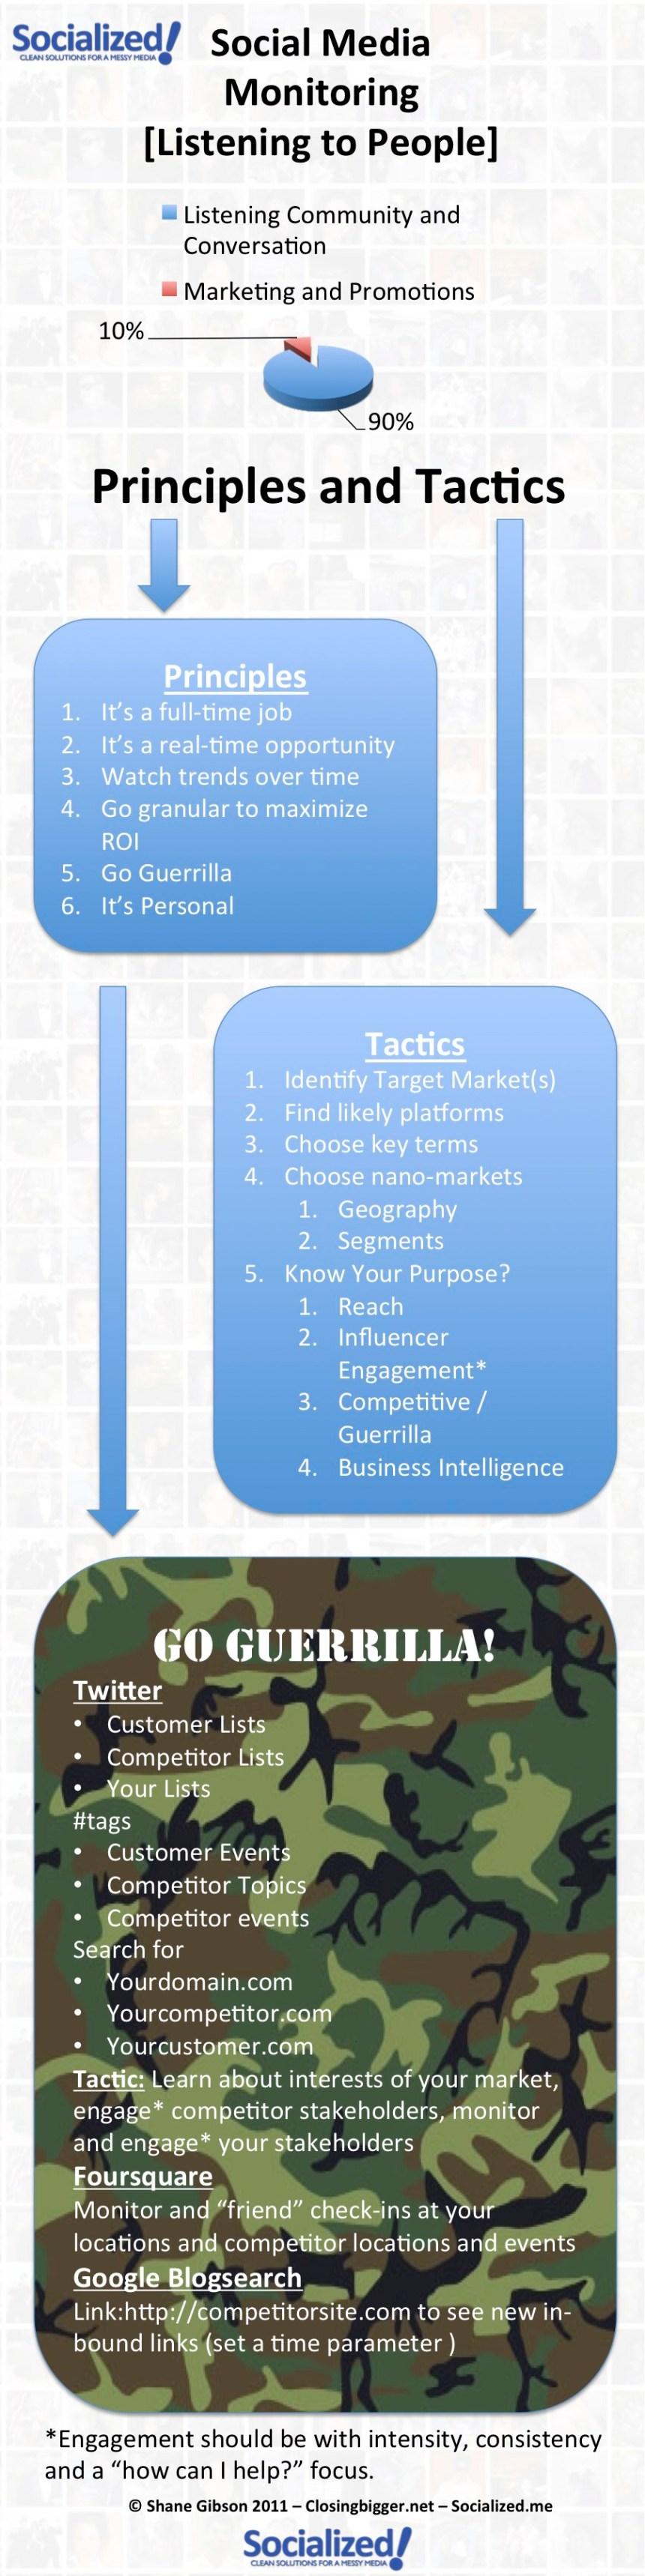 InfoGraphic Social Media Monitoring